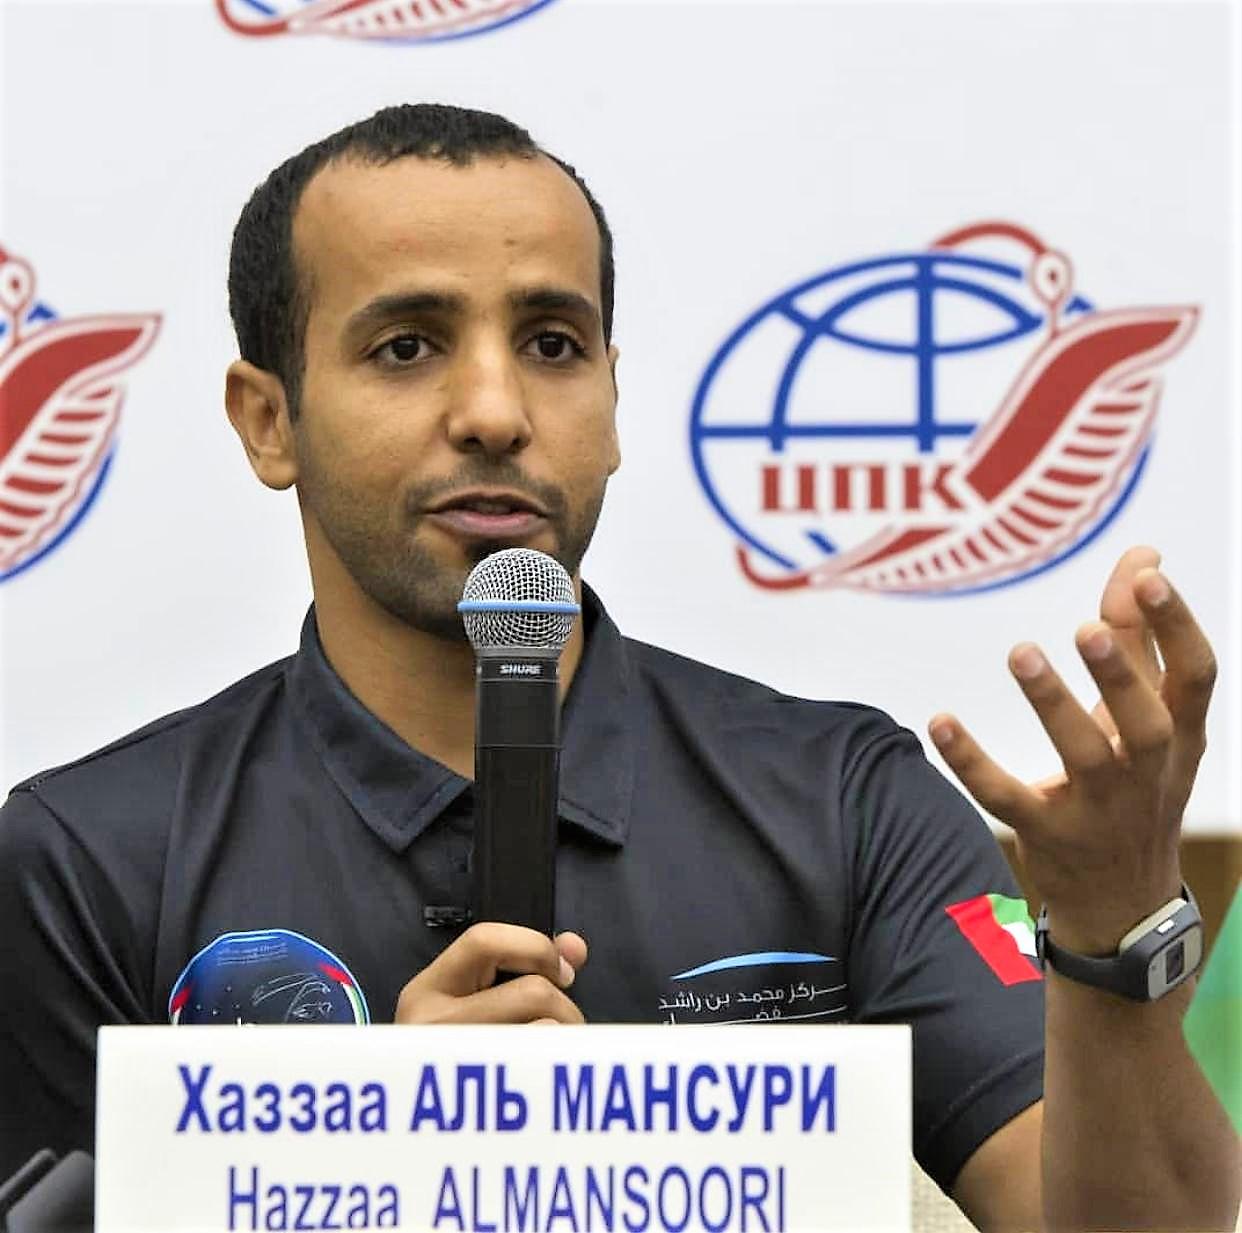 hazza al mansoori reveals post-flight details 4